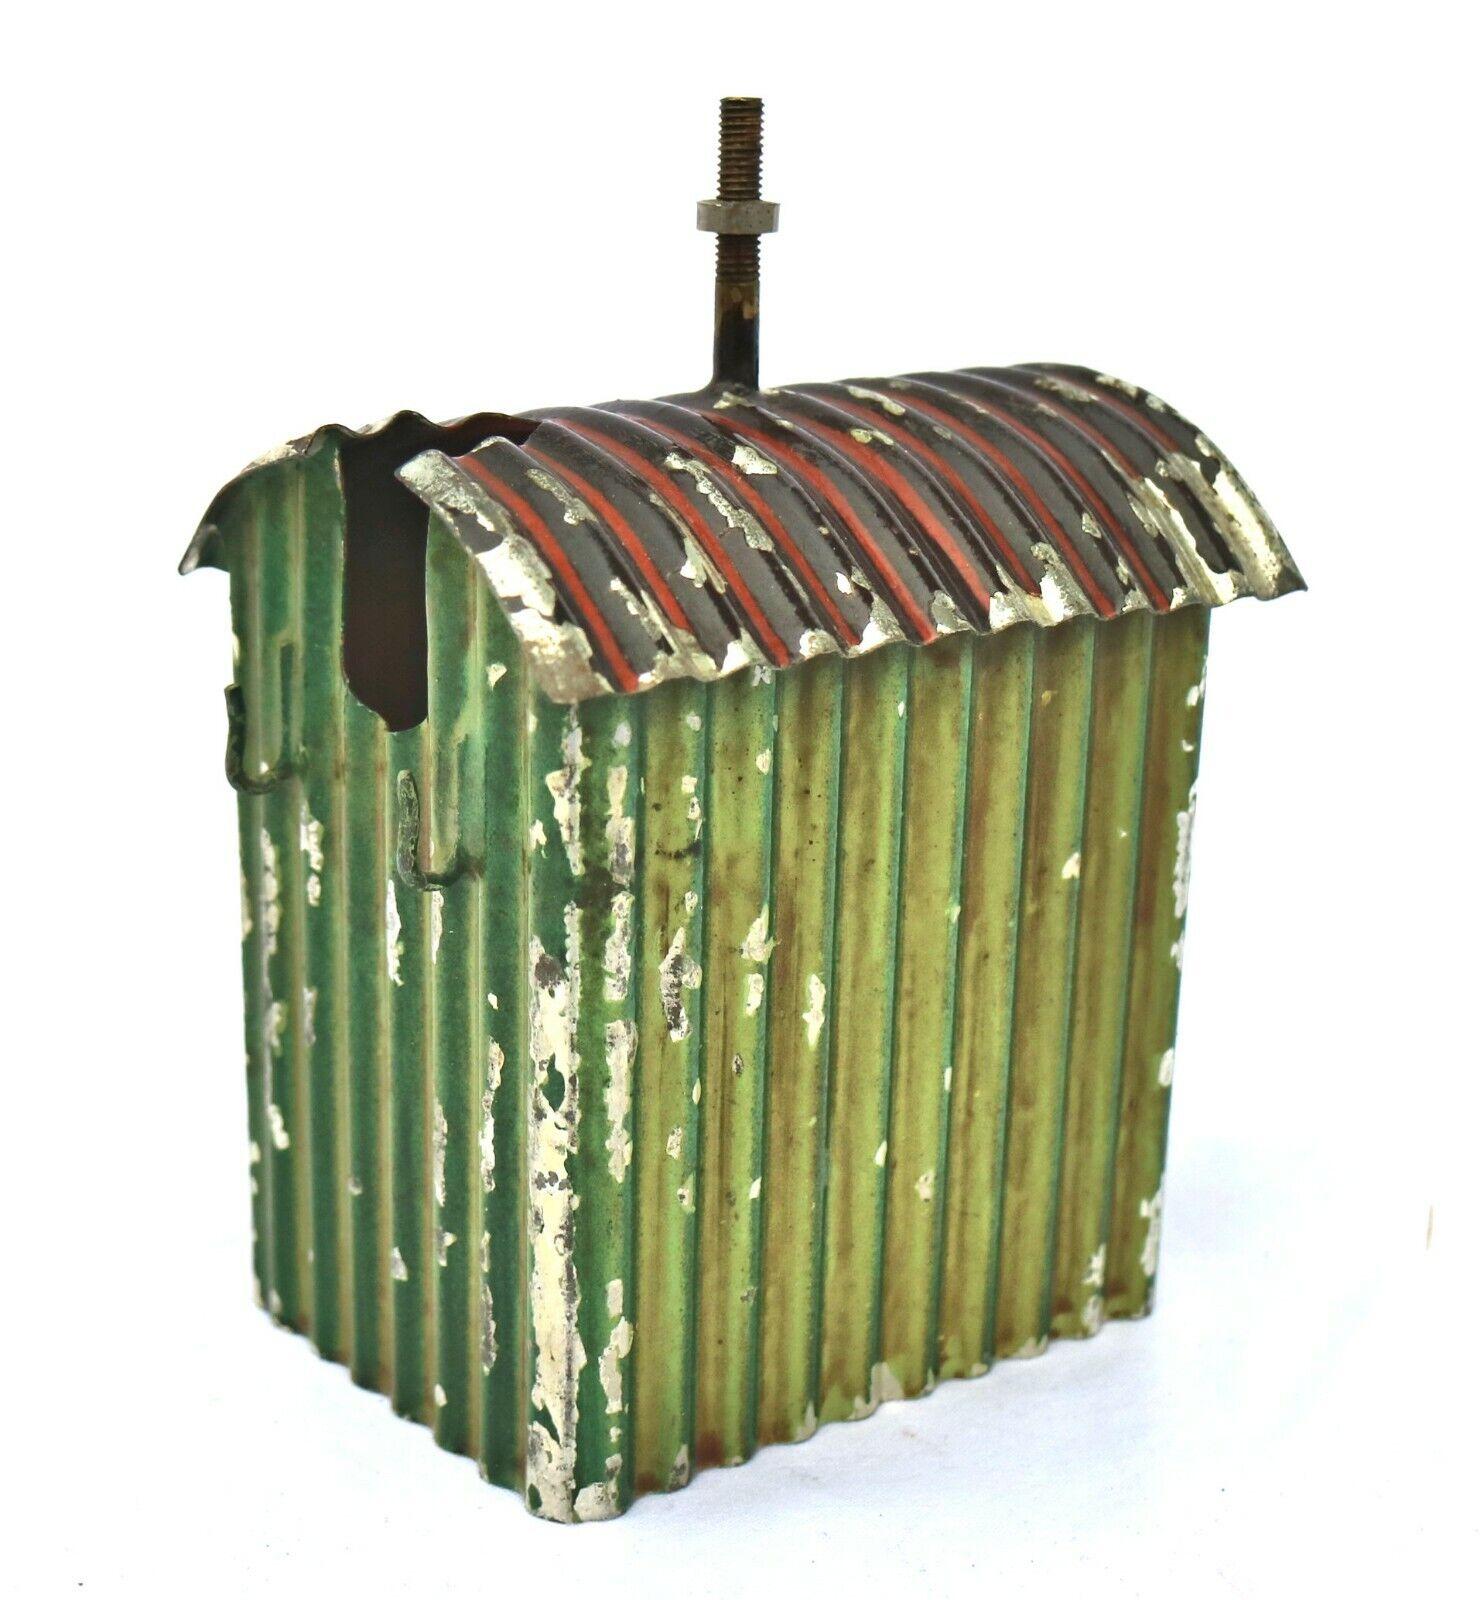 201Z  Jahr Märklin Spur 1 Glocke Hütte   Shack Teil für Klingeln 2172 1